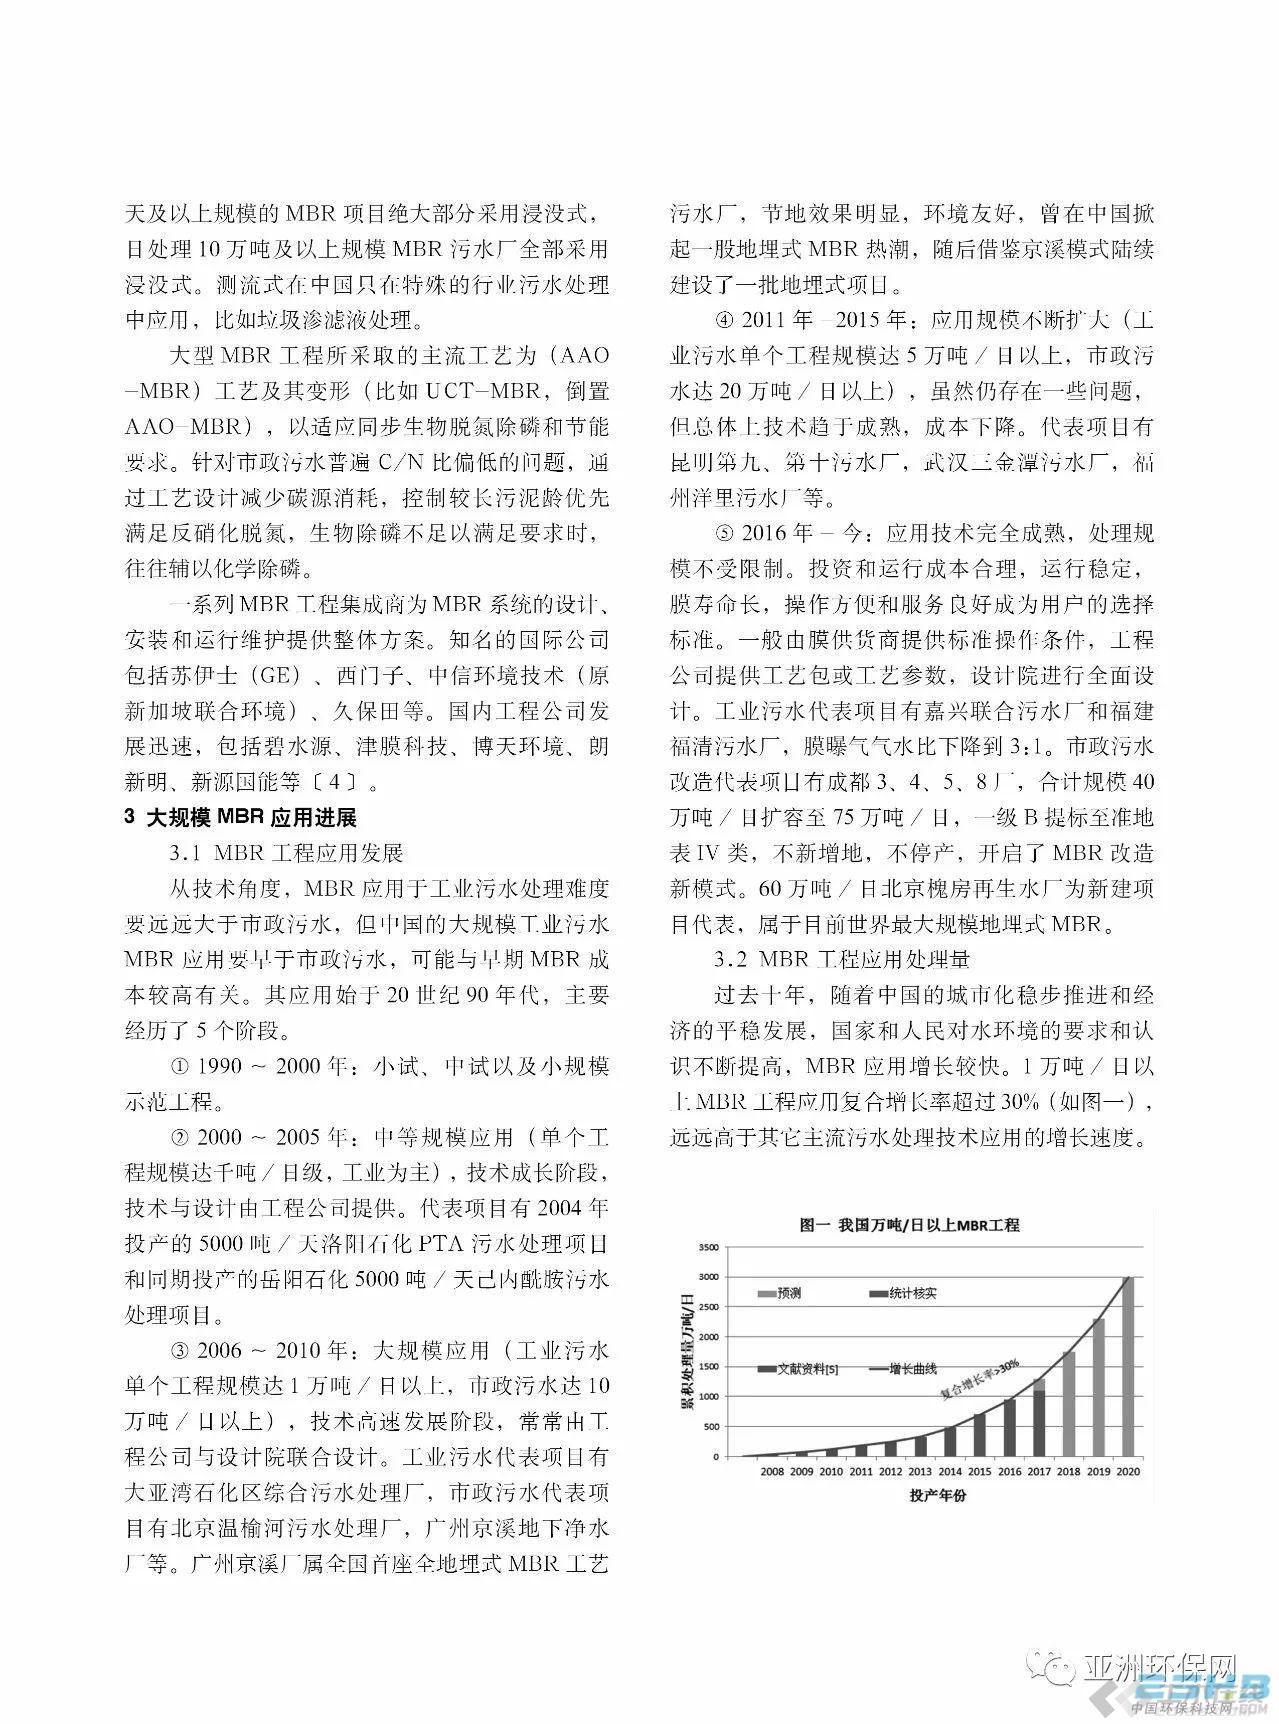 MBR技术在中国大型污水项目中的应用进展3.jpg